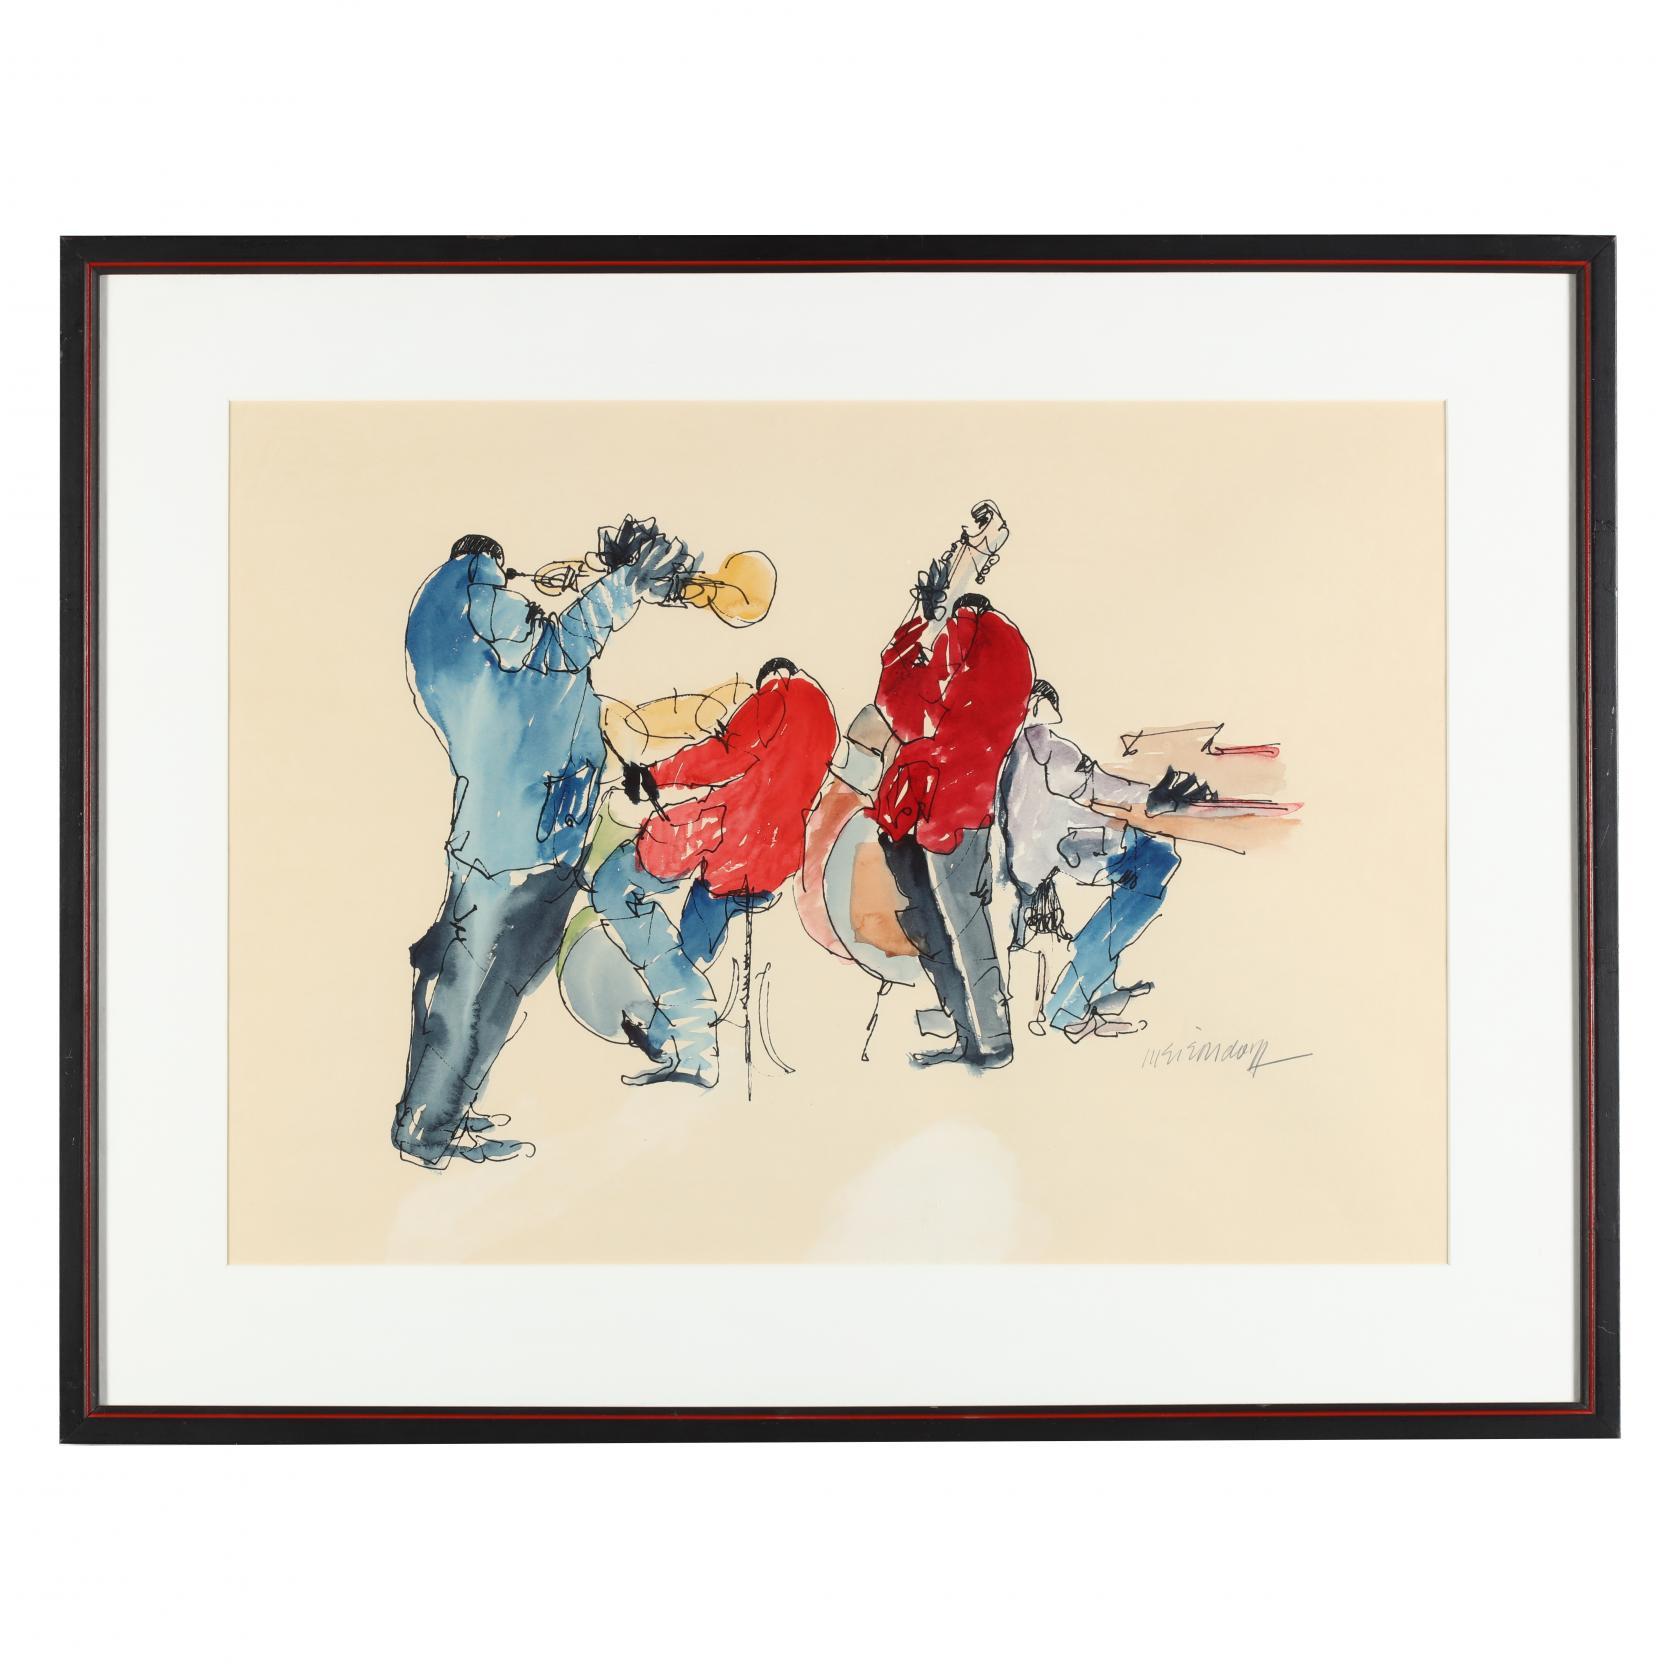 leo-meiersdorff-american-new-orleans-1934-1994-a-jazz-band